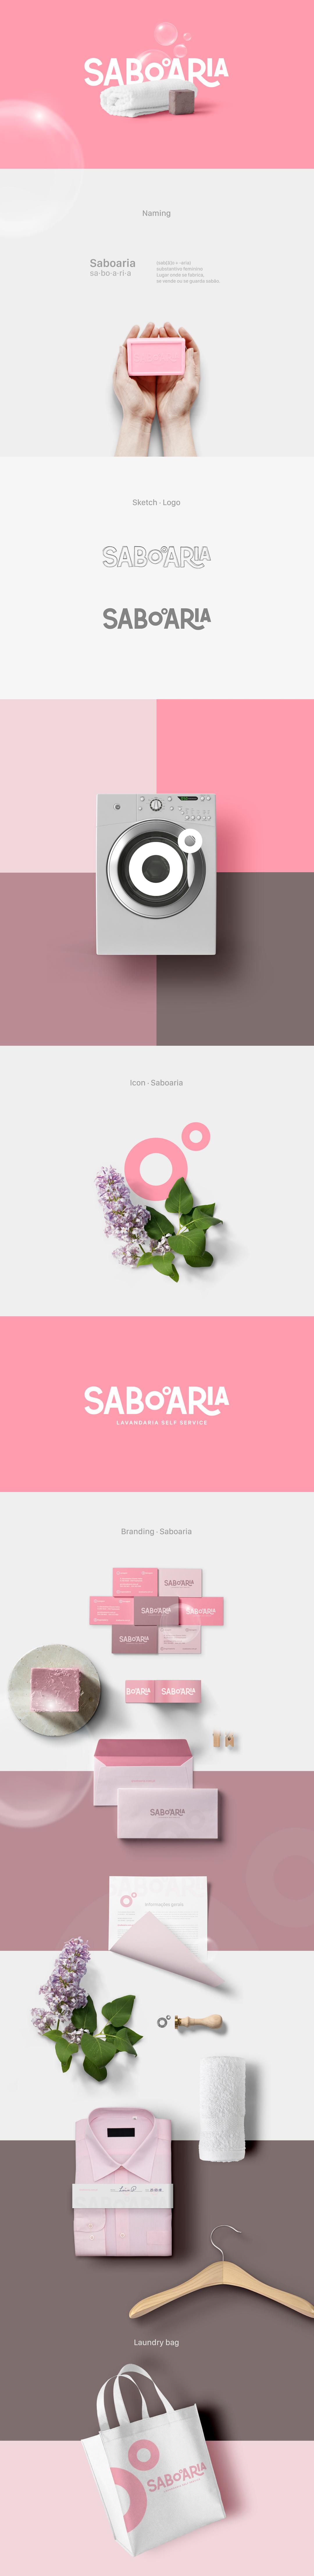 Branding,Graphic Design,Creative Direction